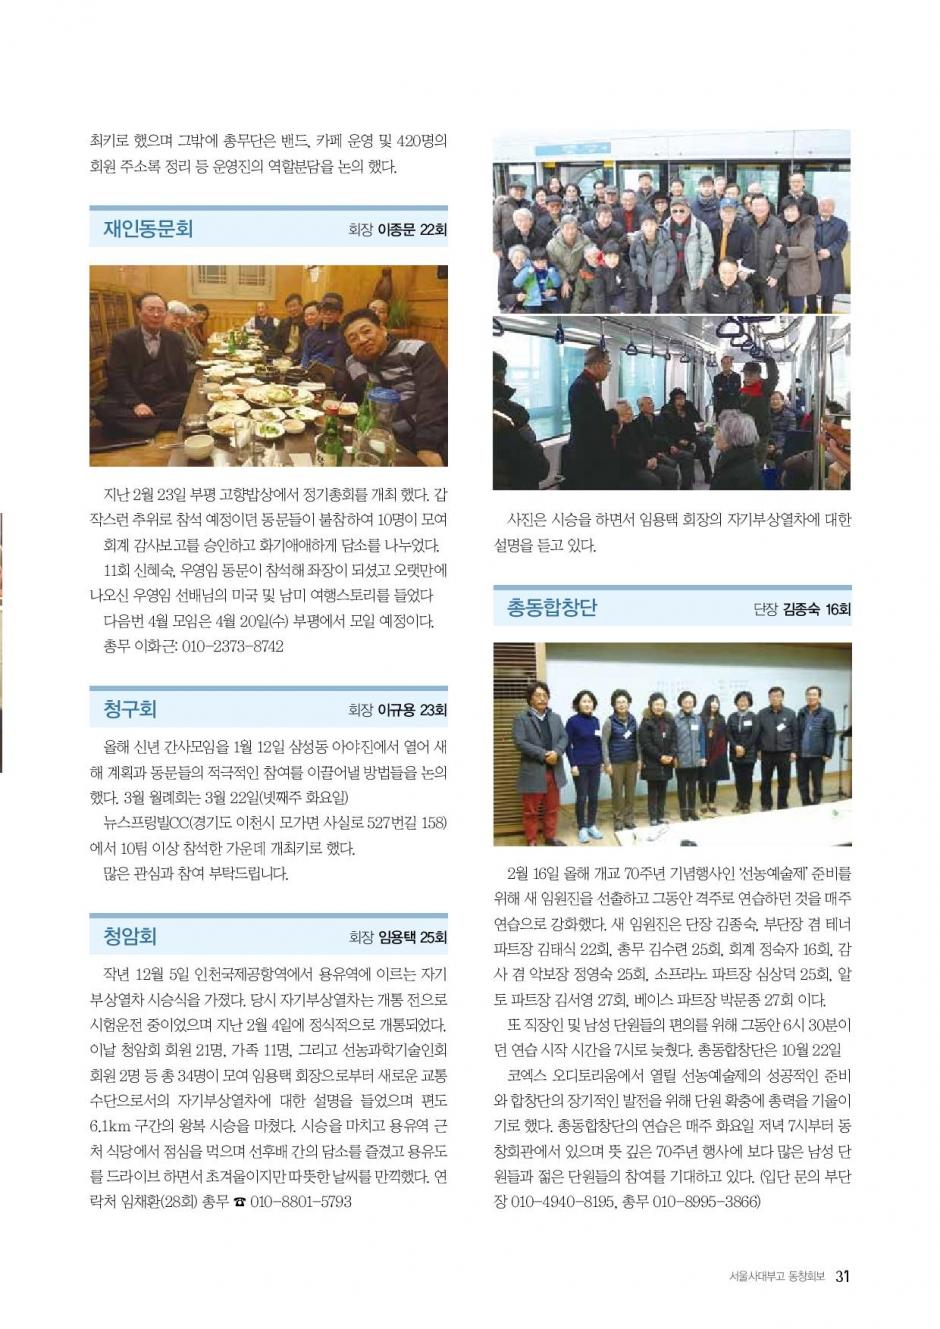 snubugo_98-page-031.jpg